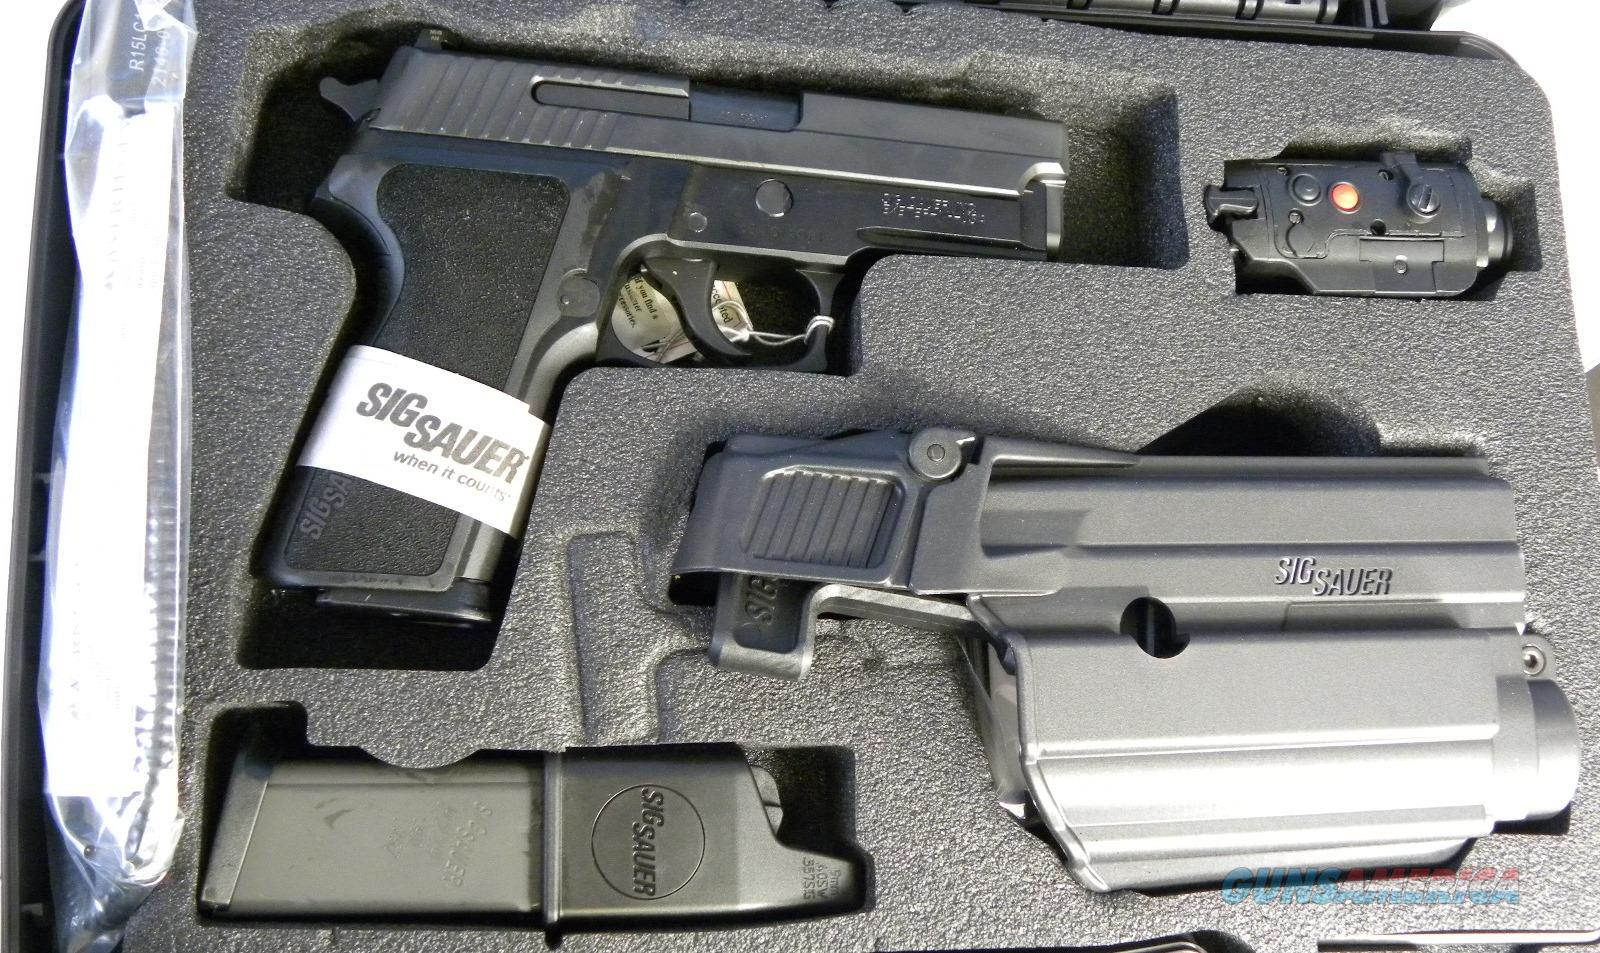 Sig Sauer 229R-40-BSS-TACPAC w/ Laser  Guns > Pistols > Sig - Sauer/Sigarms Pistols > P229